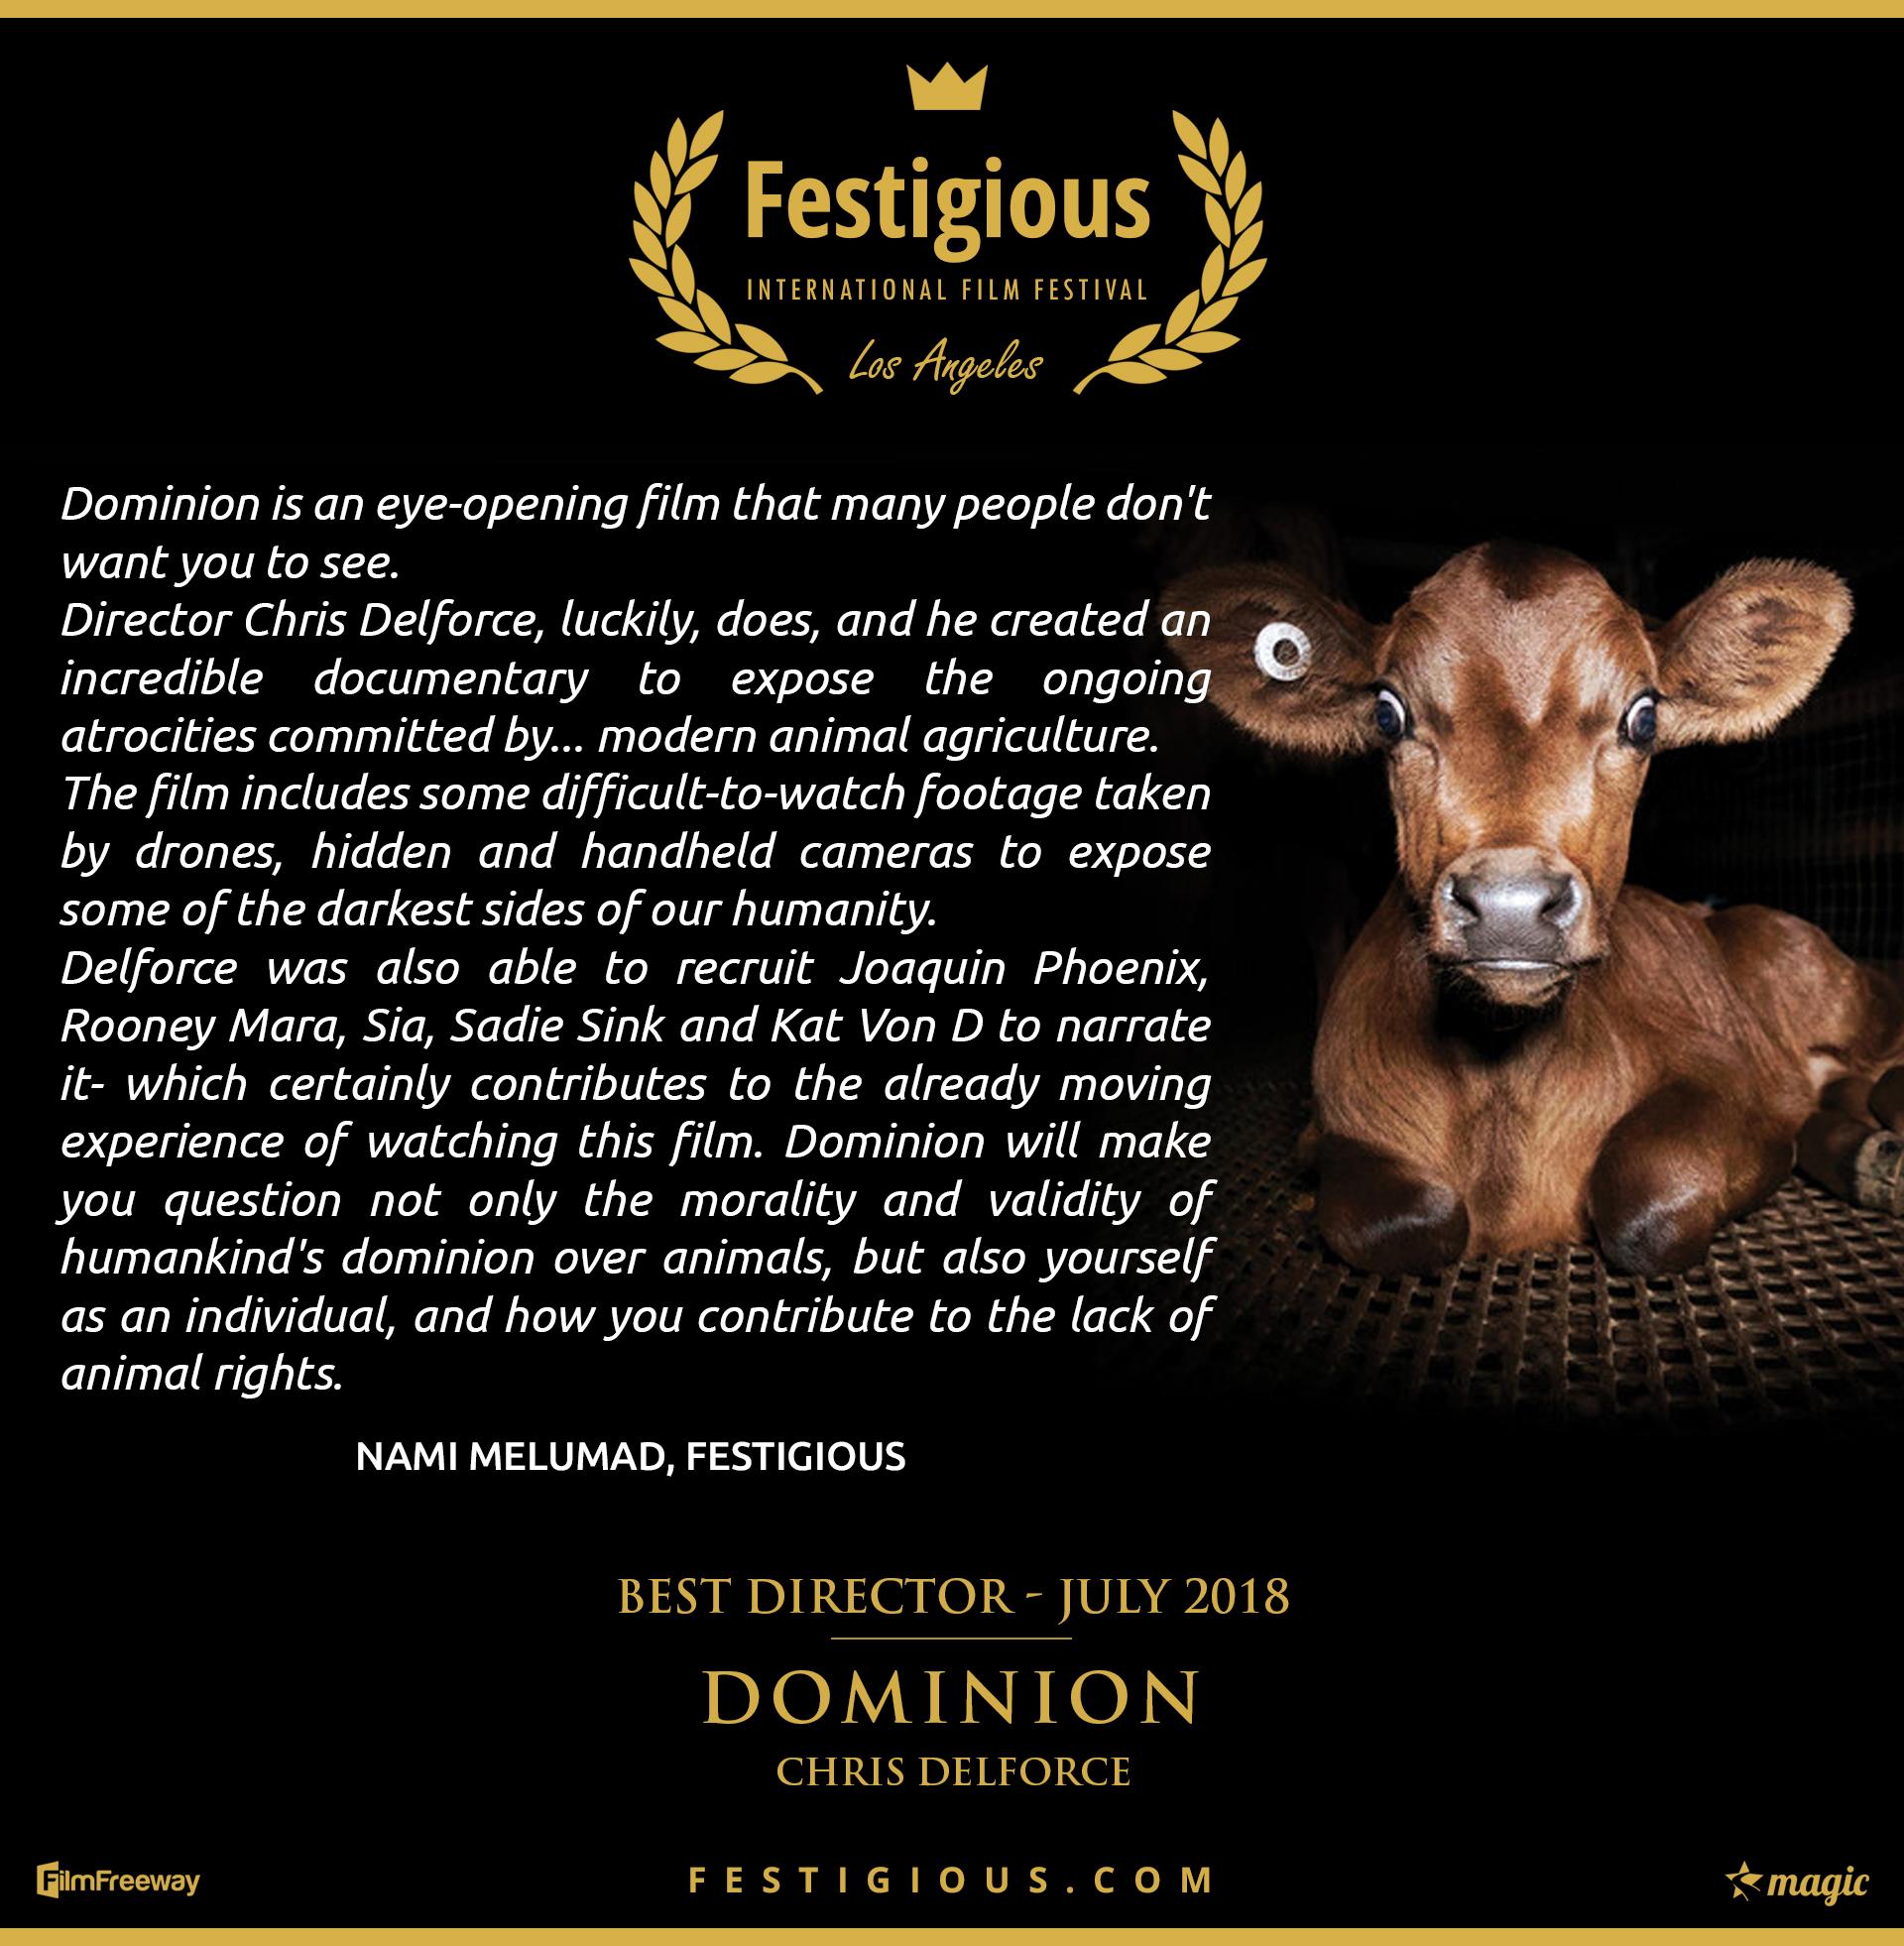 Dominion - Best Director